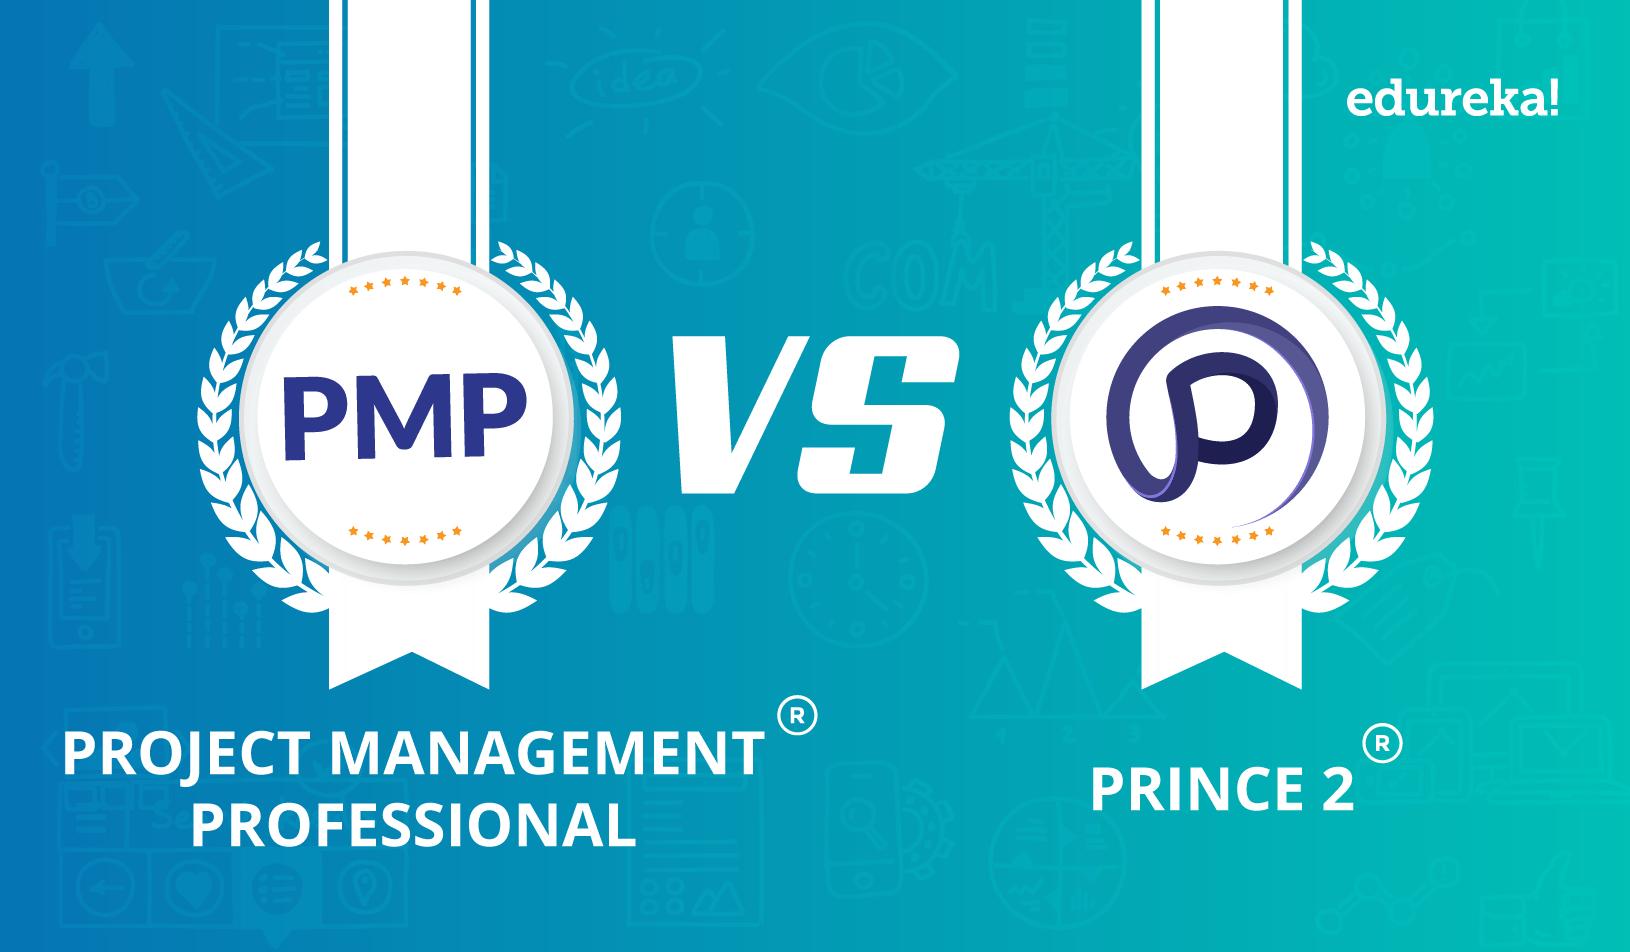 Pmp Vs Prince2 Which Certification To Choose Edureka